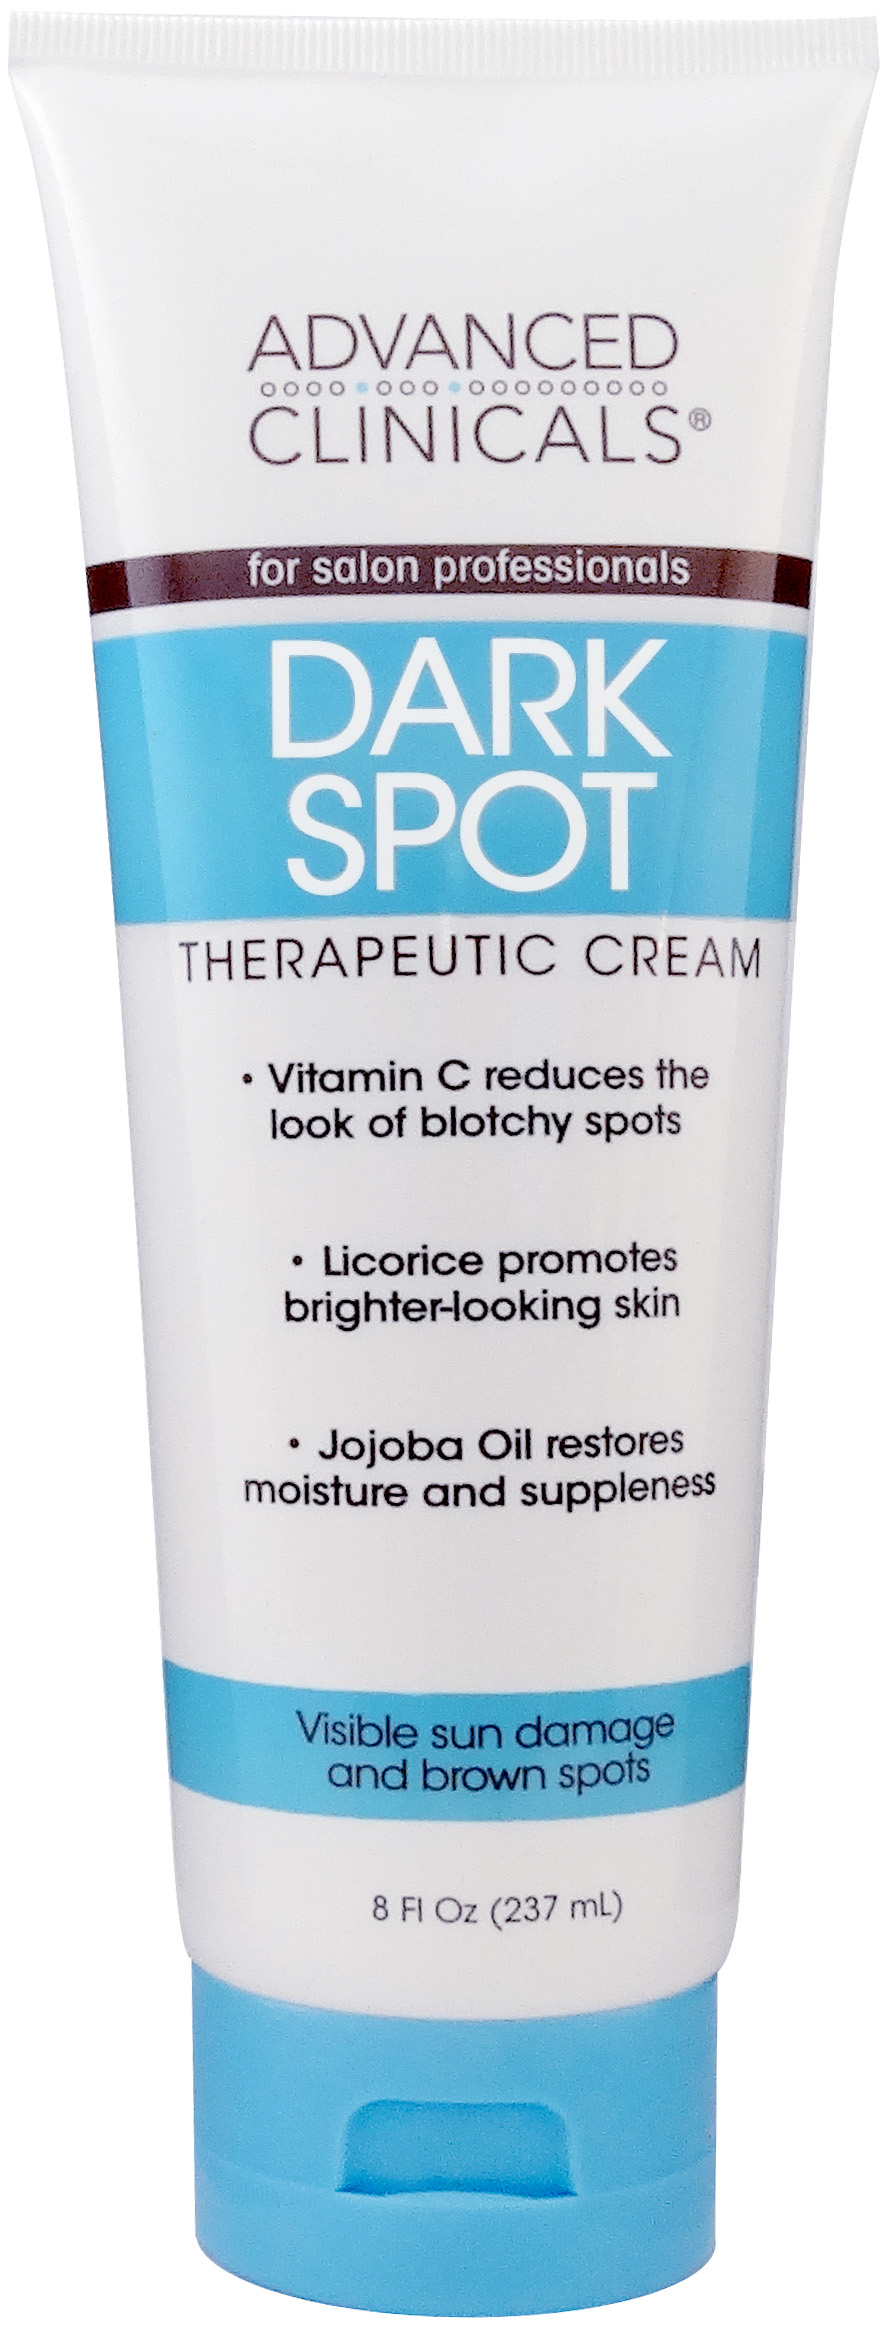 dark spot cream